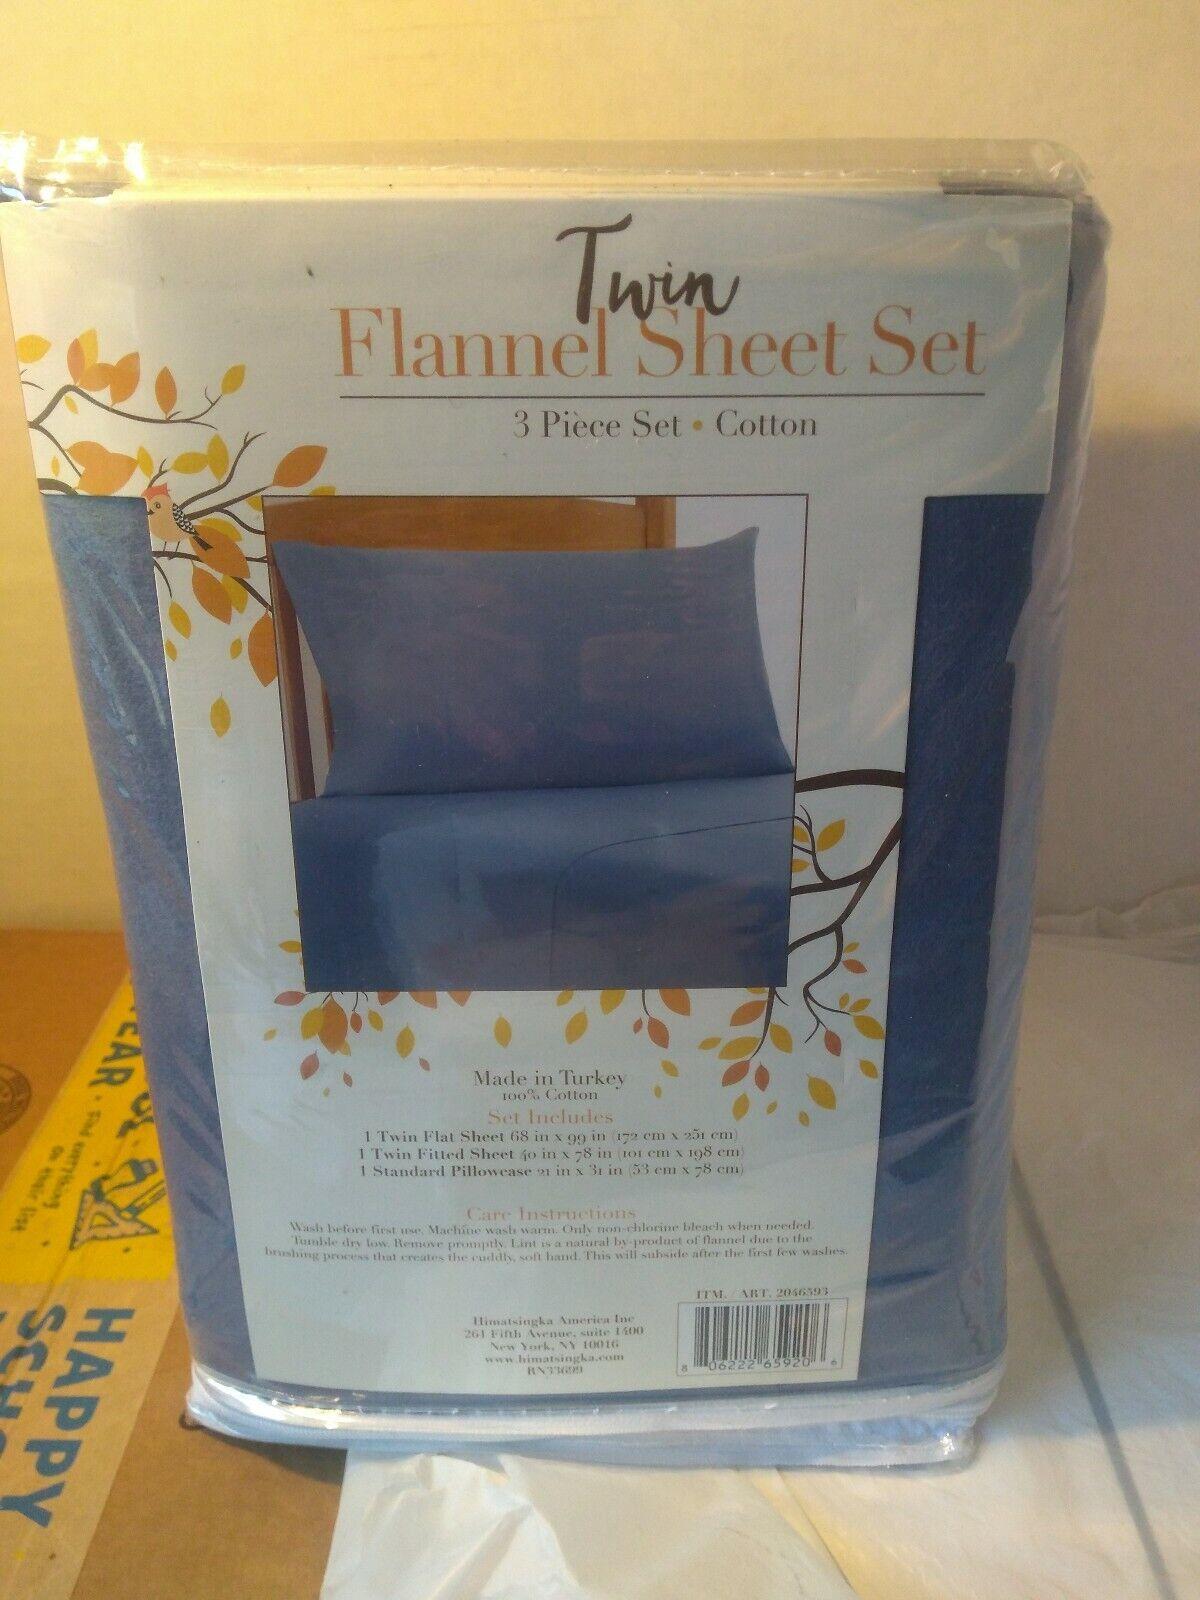 Dogs Twin Flannel 3 Piece Sheet Set 100/% Cotton Himatsingka America